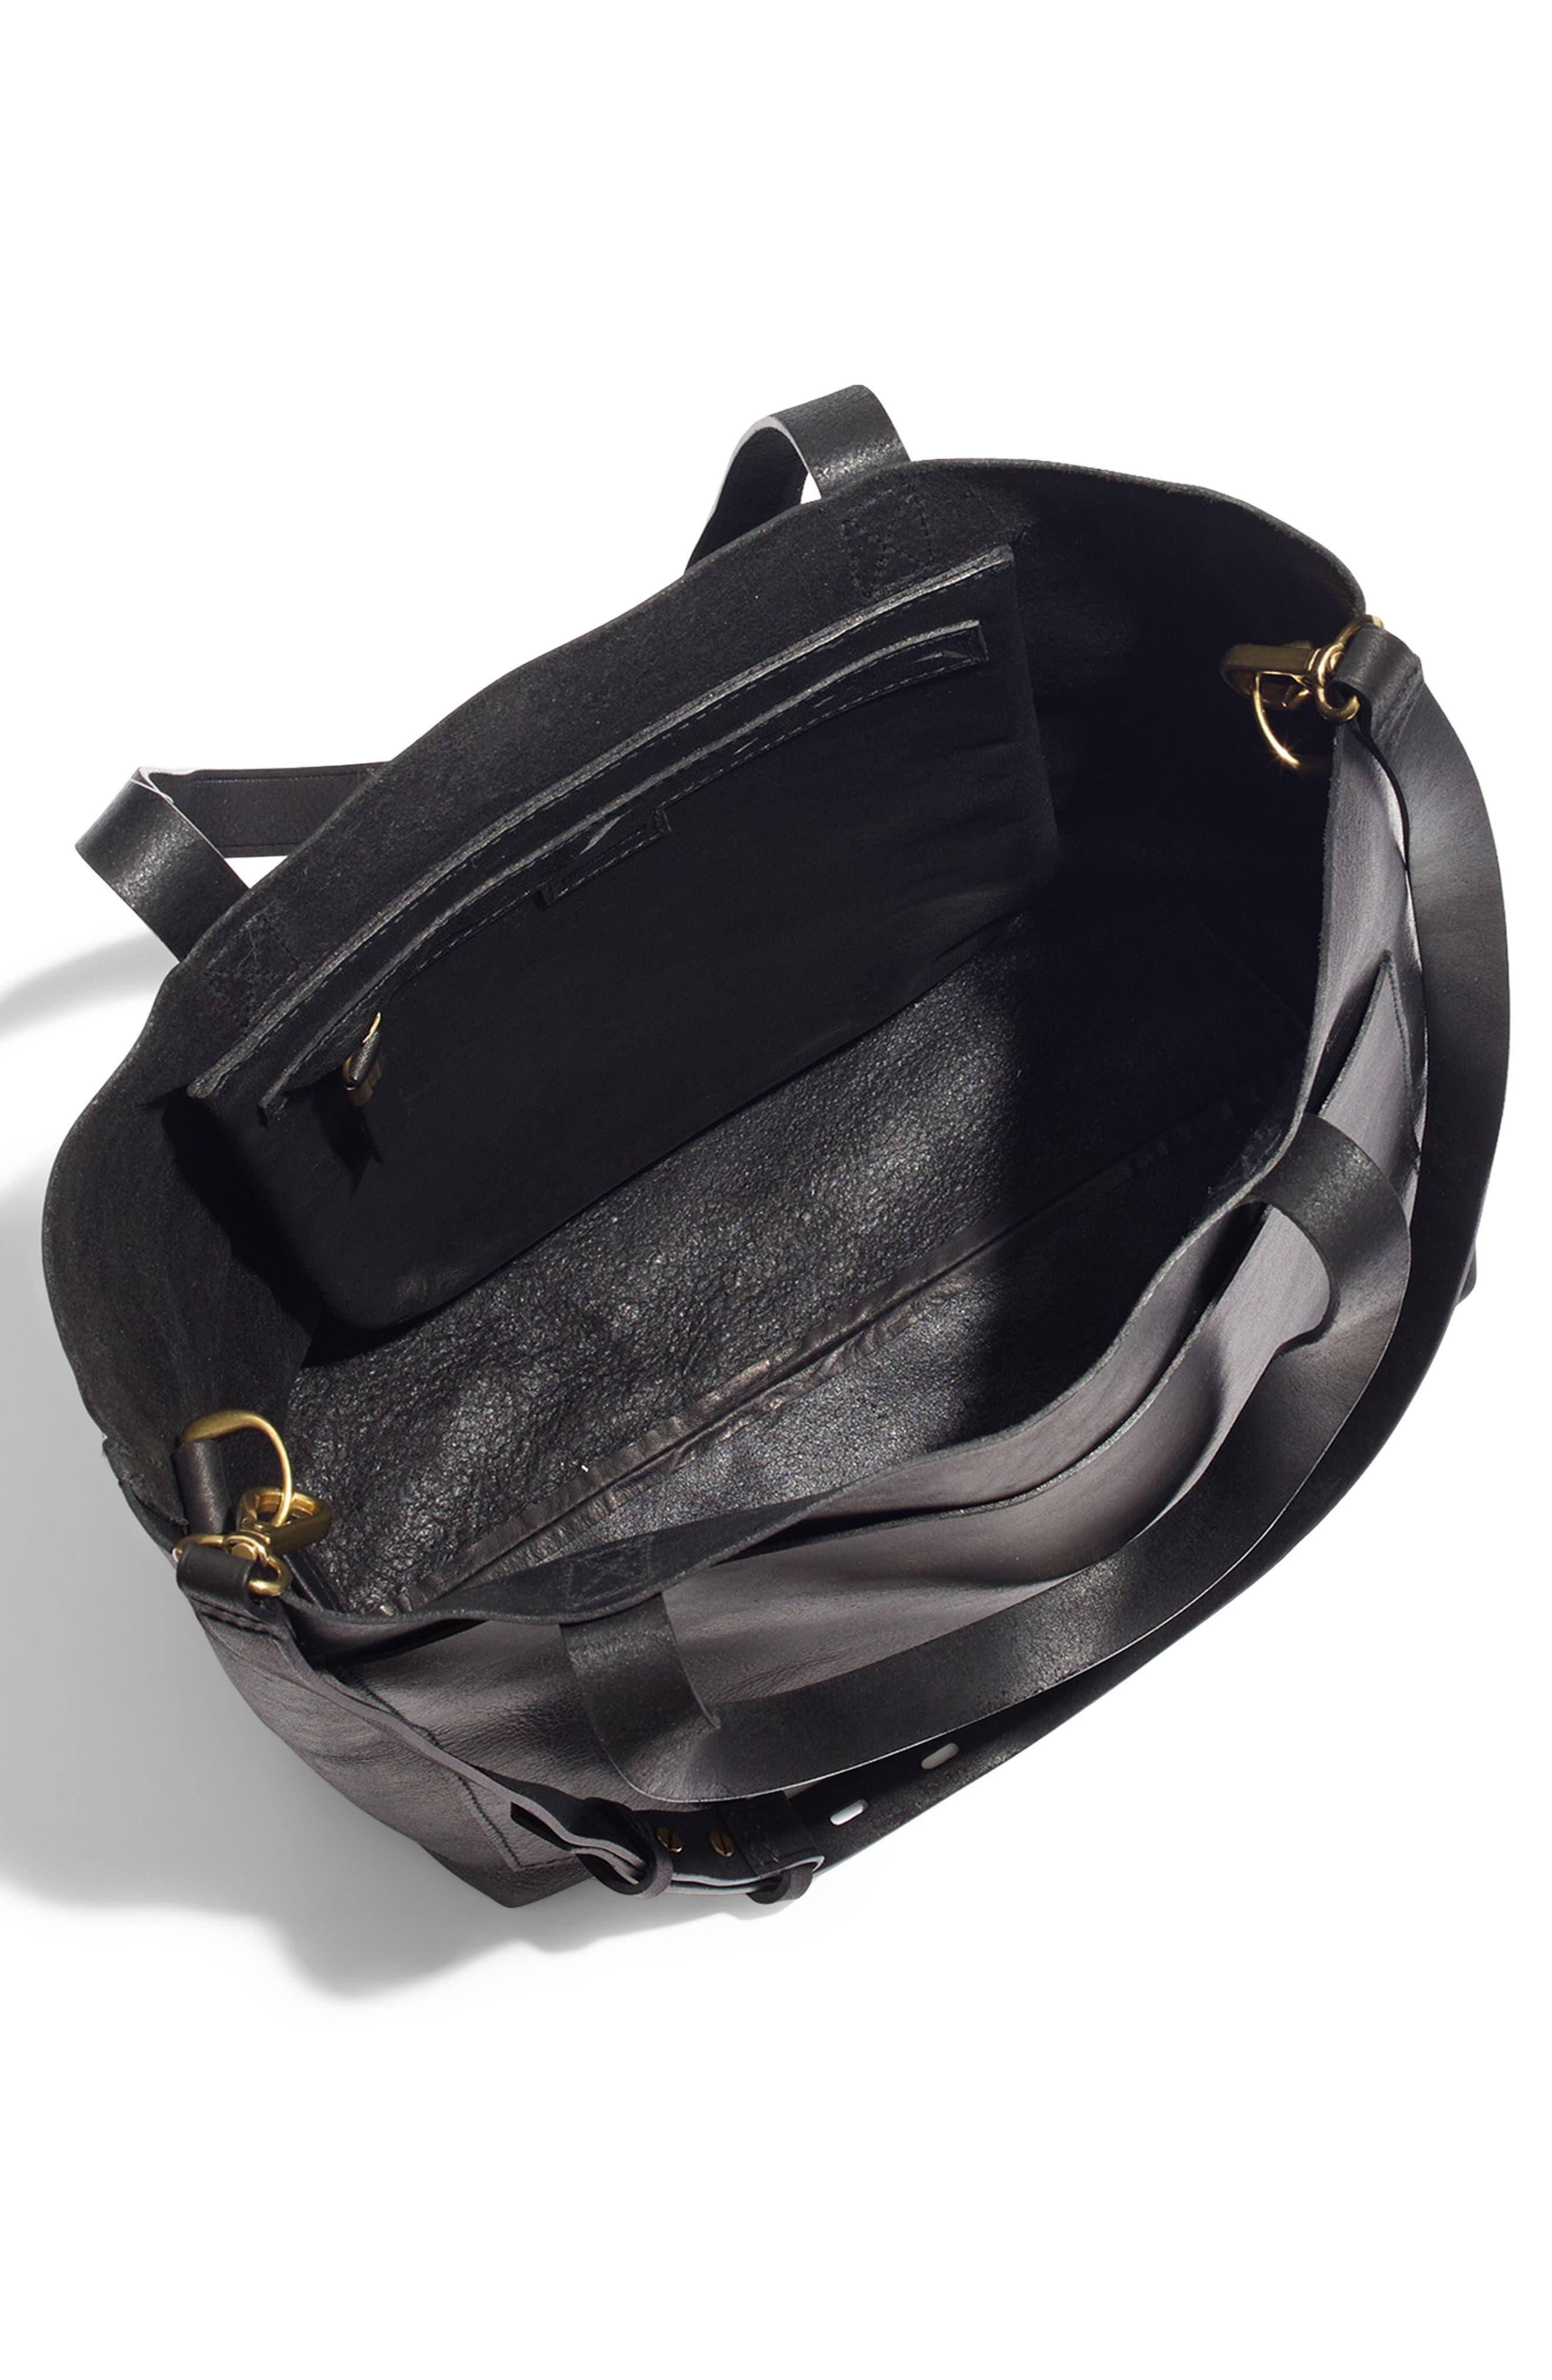 Medium Leather Transport Tote,                             Alternate thumbnail 4, color,                             TRUE BLACK